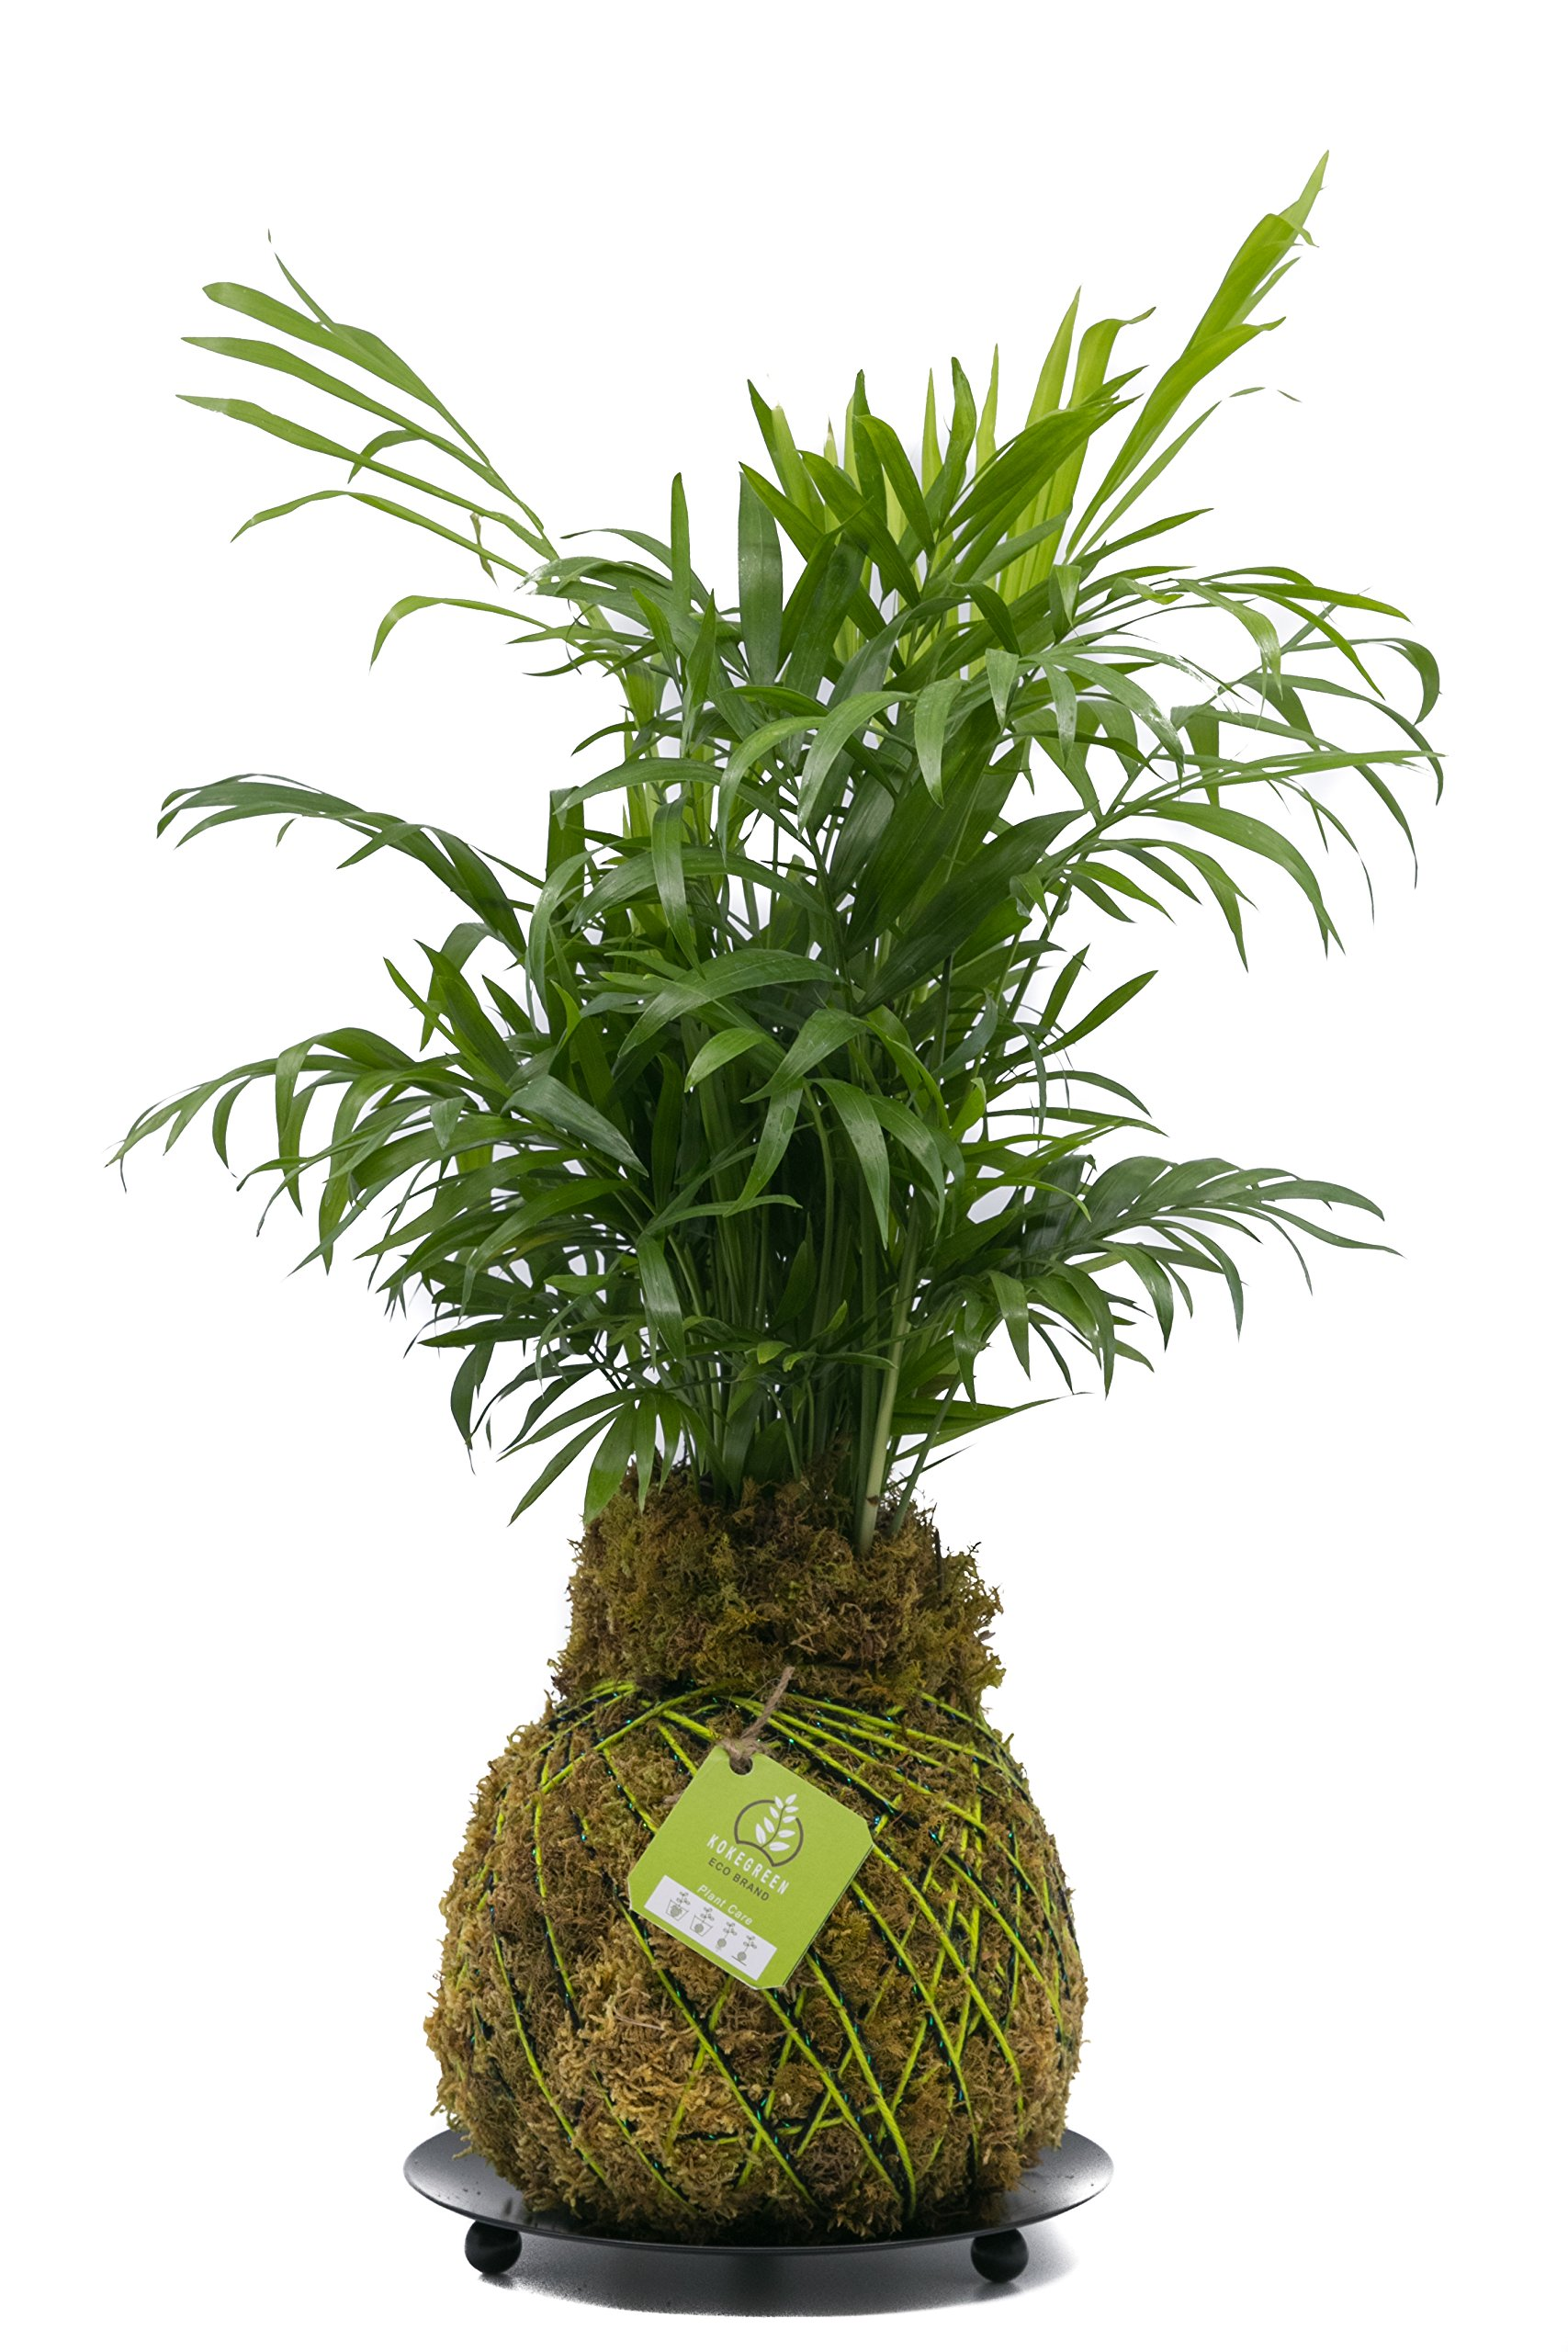 KOKEDAMA INDOOR PLANT (SHINE BLACK & GREEN), PURIFIER PLANT, NEATHE BELLA PALM, HOME DECOR, ECOLOGIC, NASA PLANT, JAPANESE TECHNIQUE